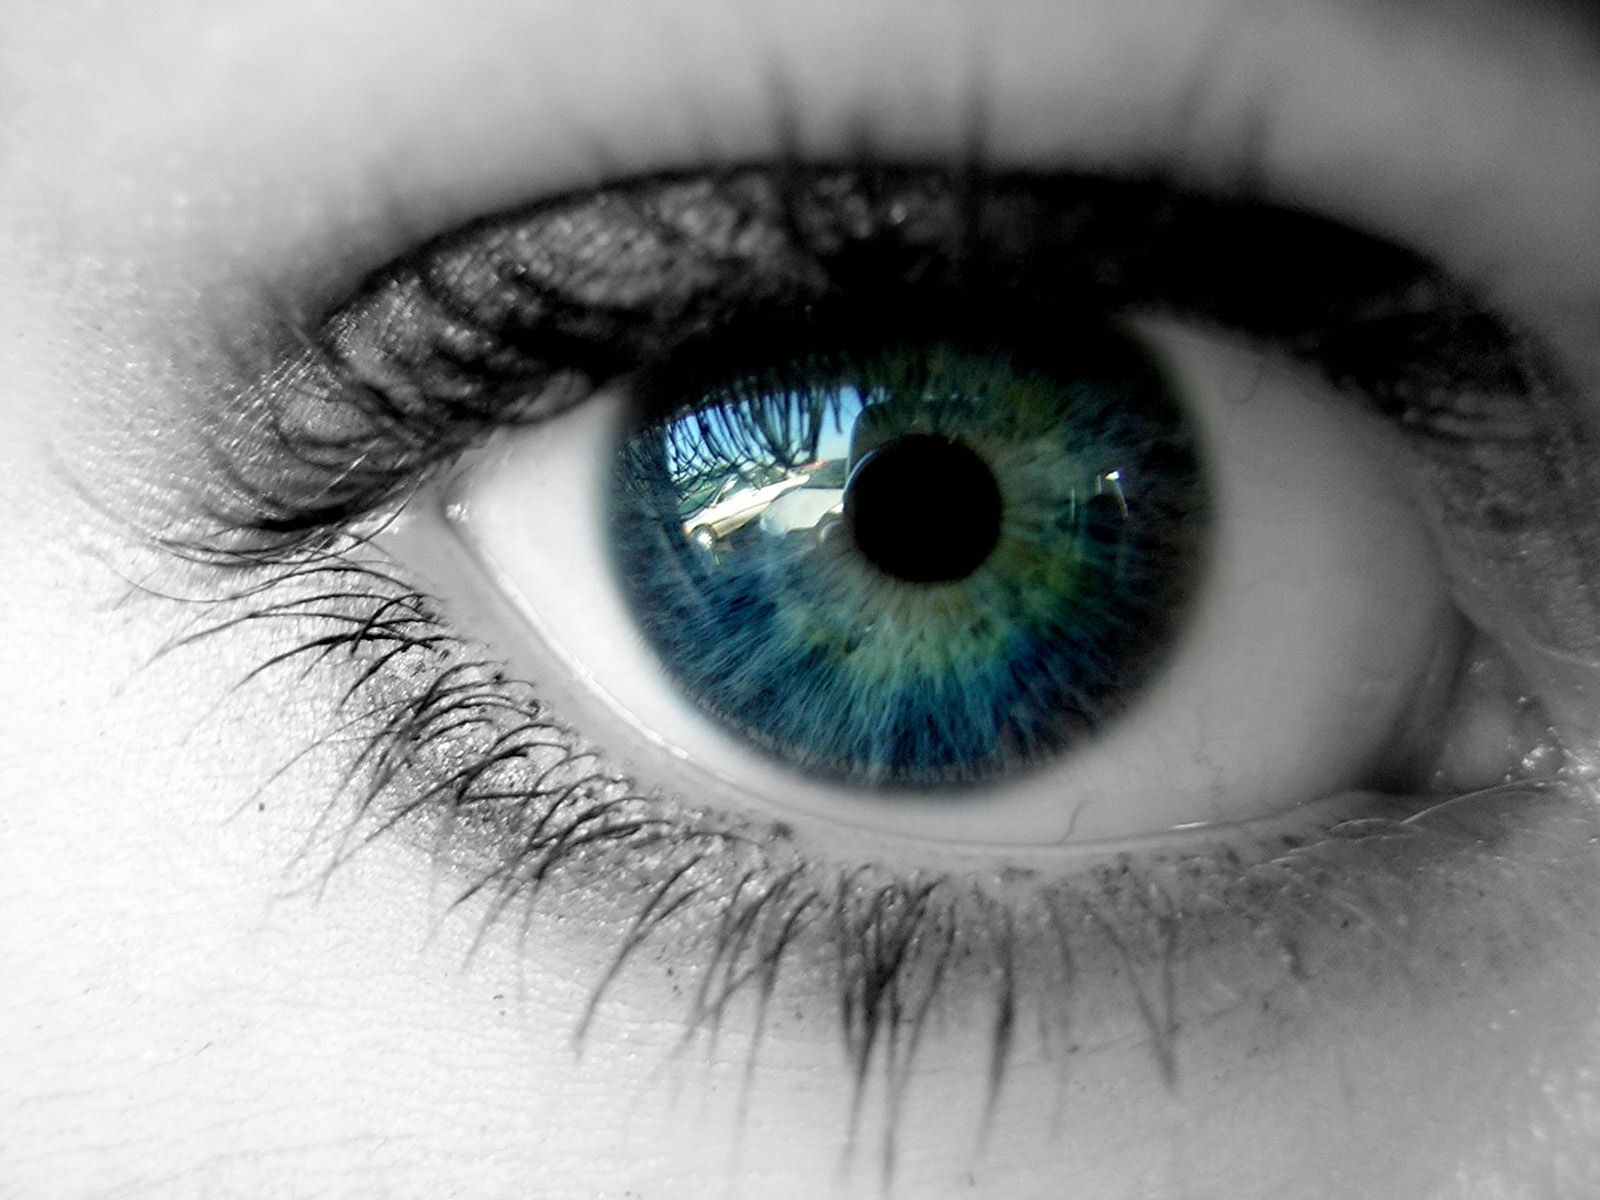 http://3.bp.blogspot.com/_F-WURB3XYwA/TS2CSix6uqI/AAAAAAAAAQw/AVmljH19ULQ/s1600/Eye_by_BaisteachCeilteach.jpg